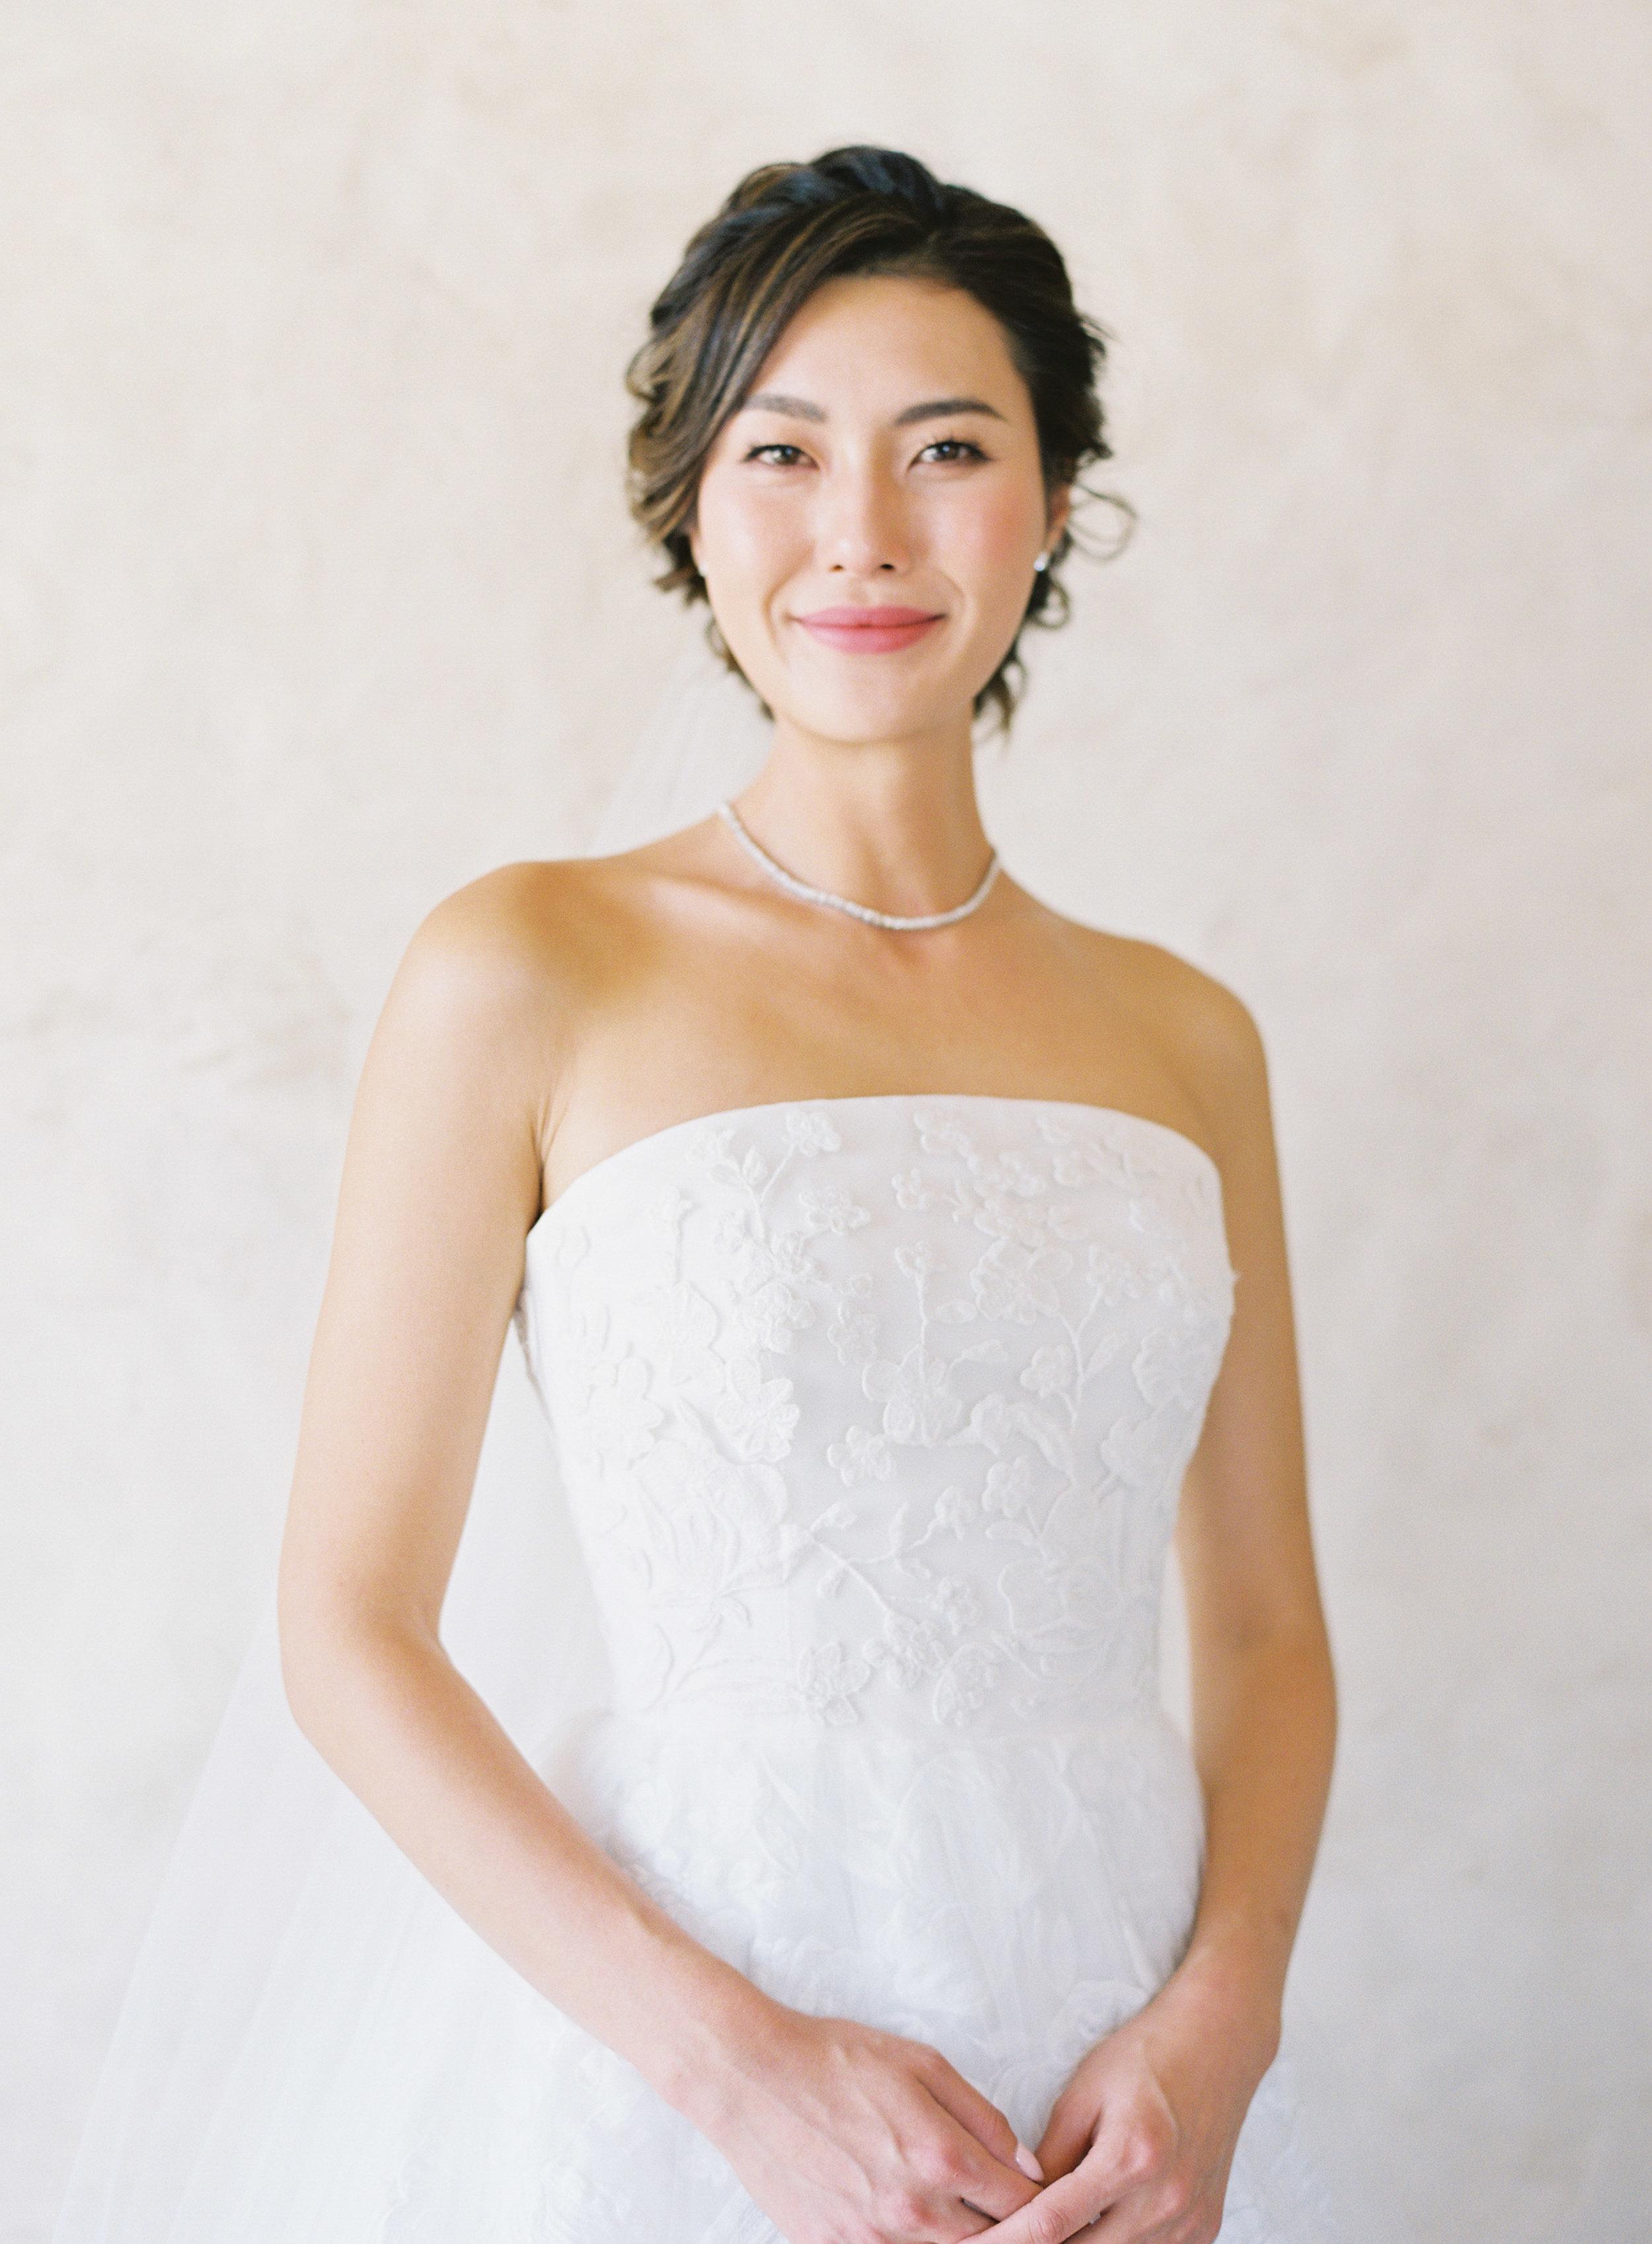 KS-Editorial-162-Jen-Huang-006975-R2-006.jpg